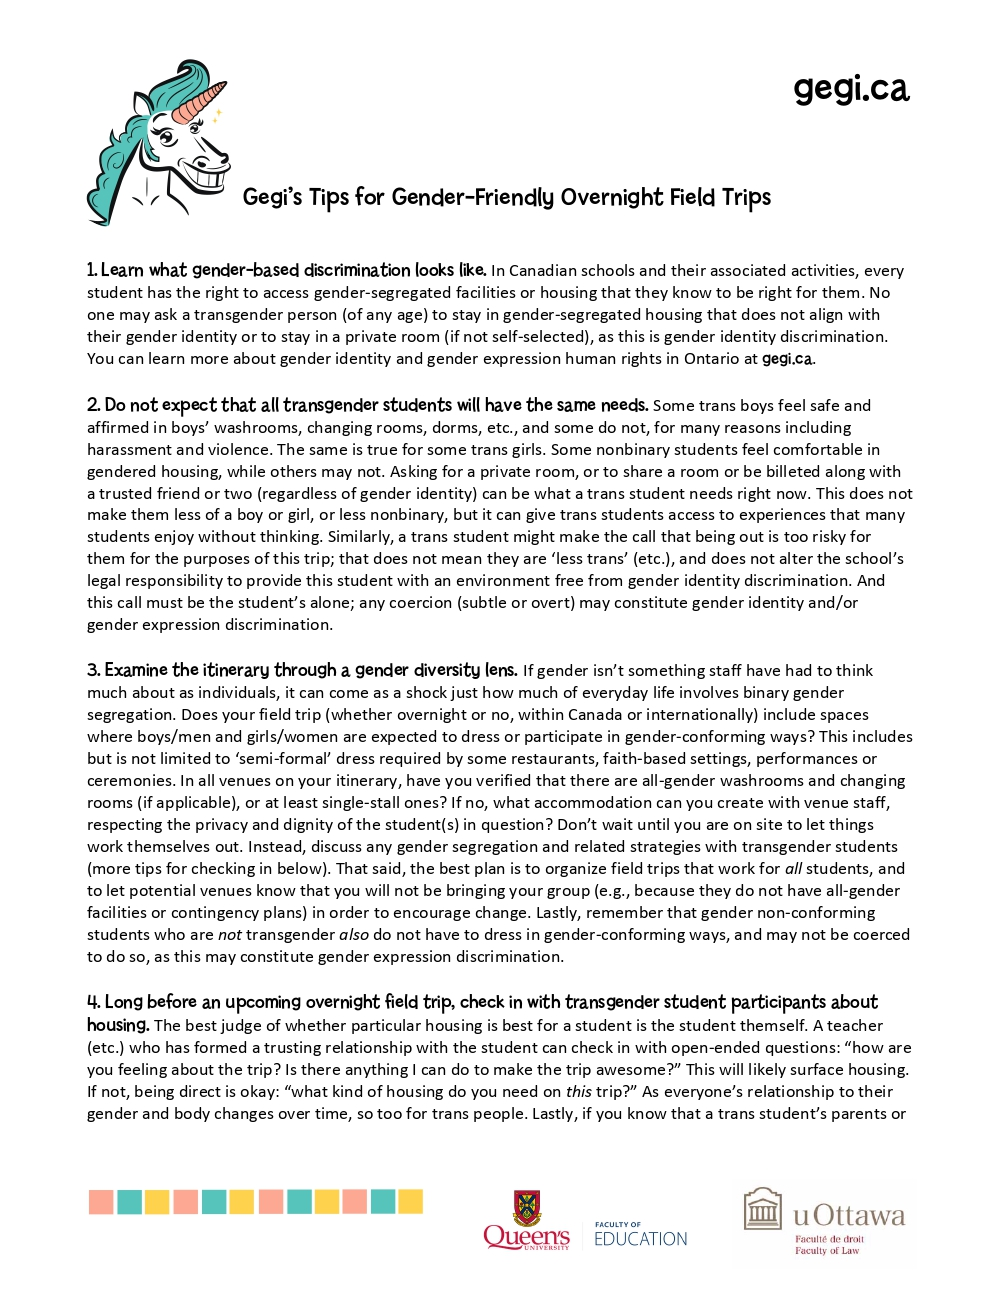 Gegi's Gender-Friendly Overnight Field Trips Tips